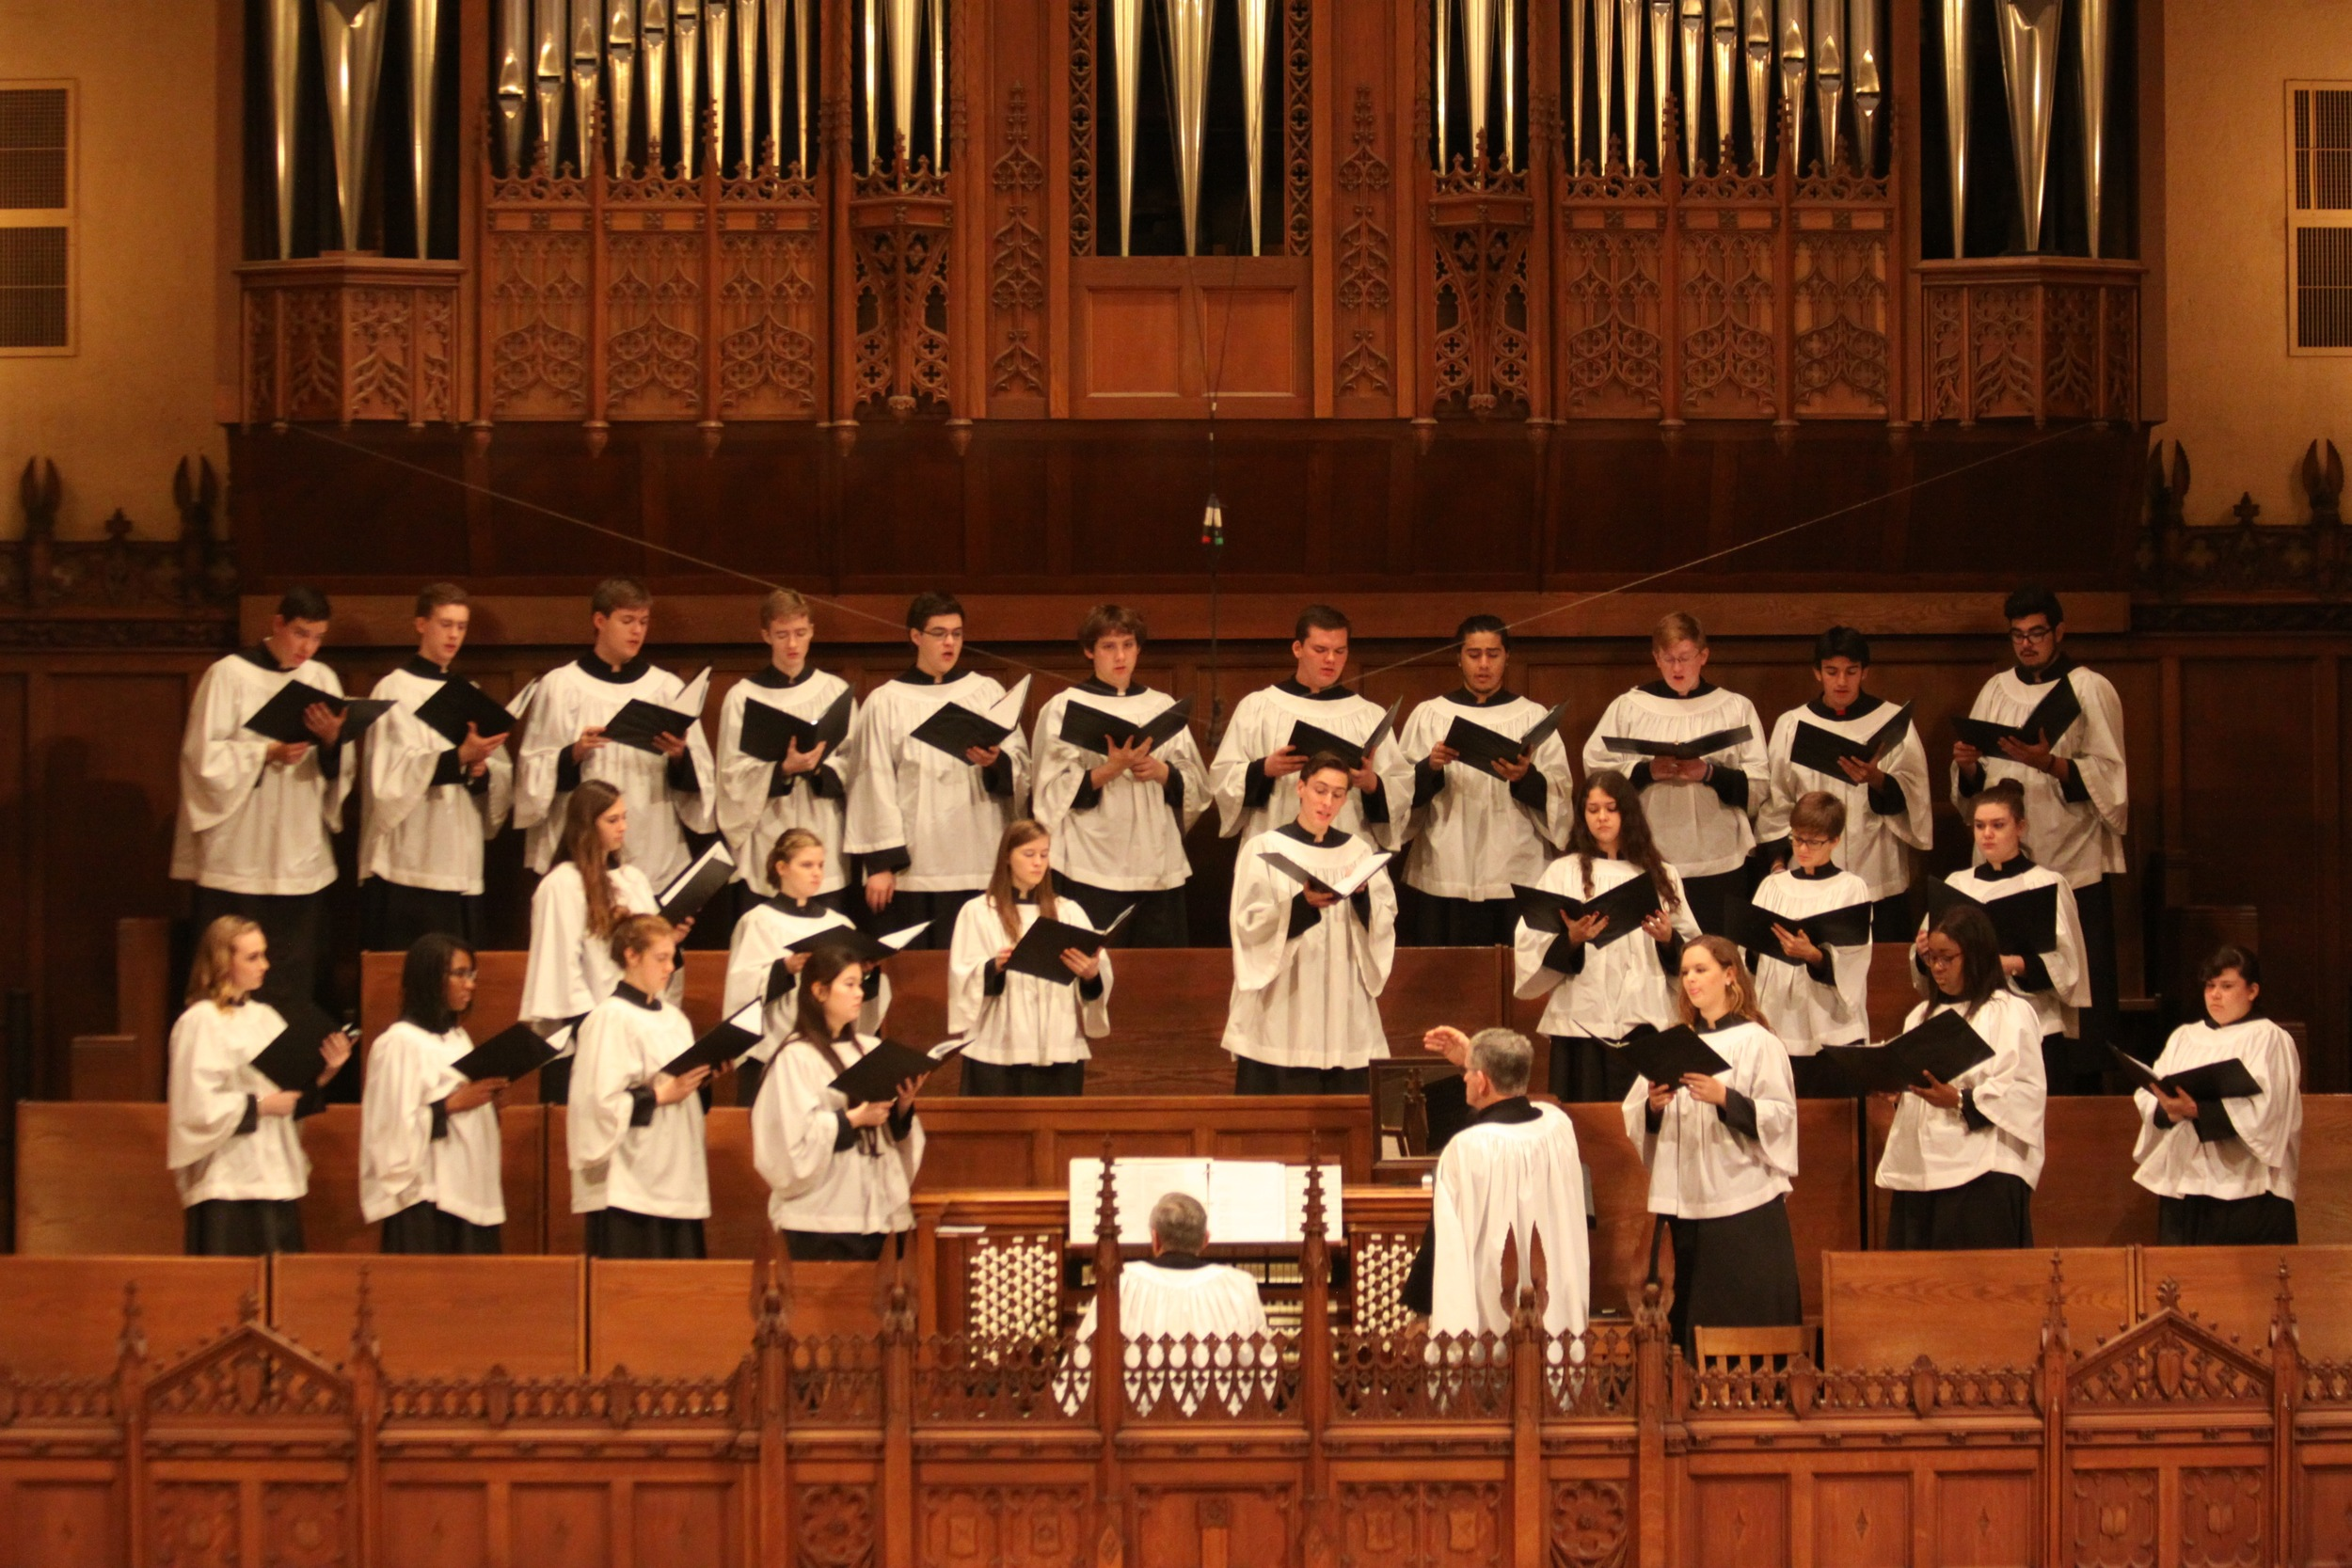 Choral Scholars 2015-16. Photograph by Robin Gandin.